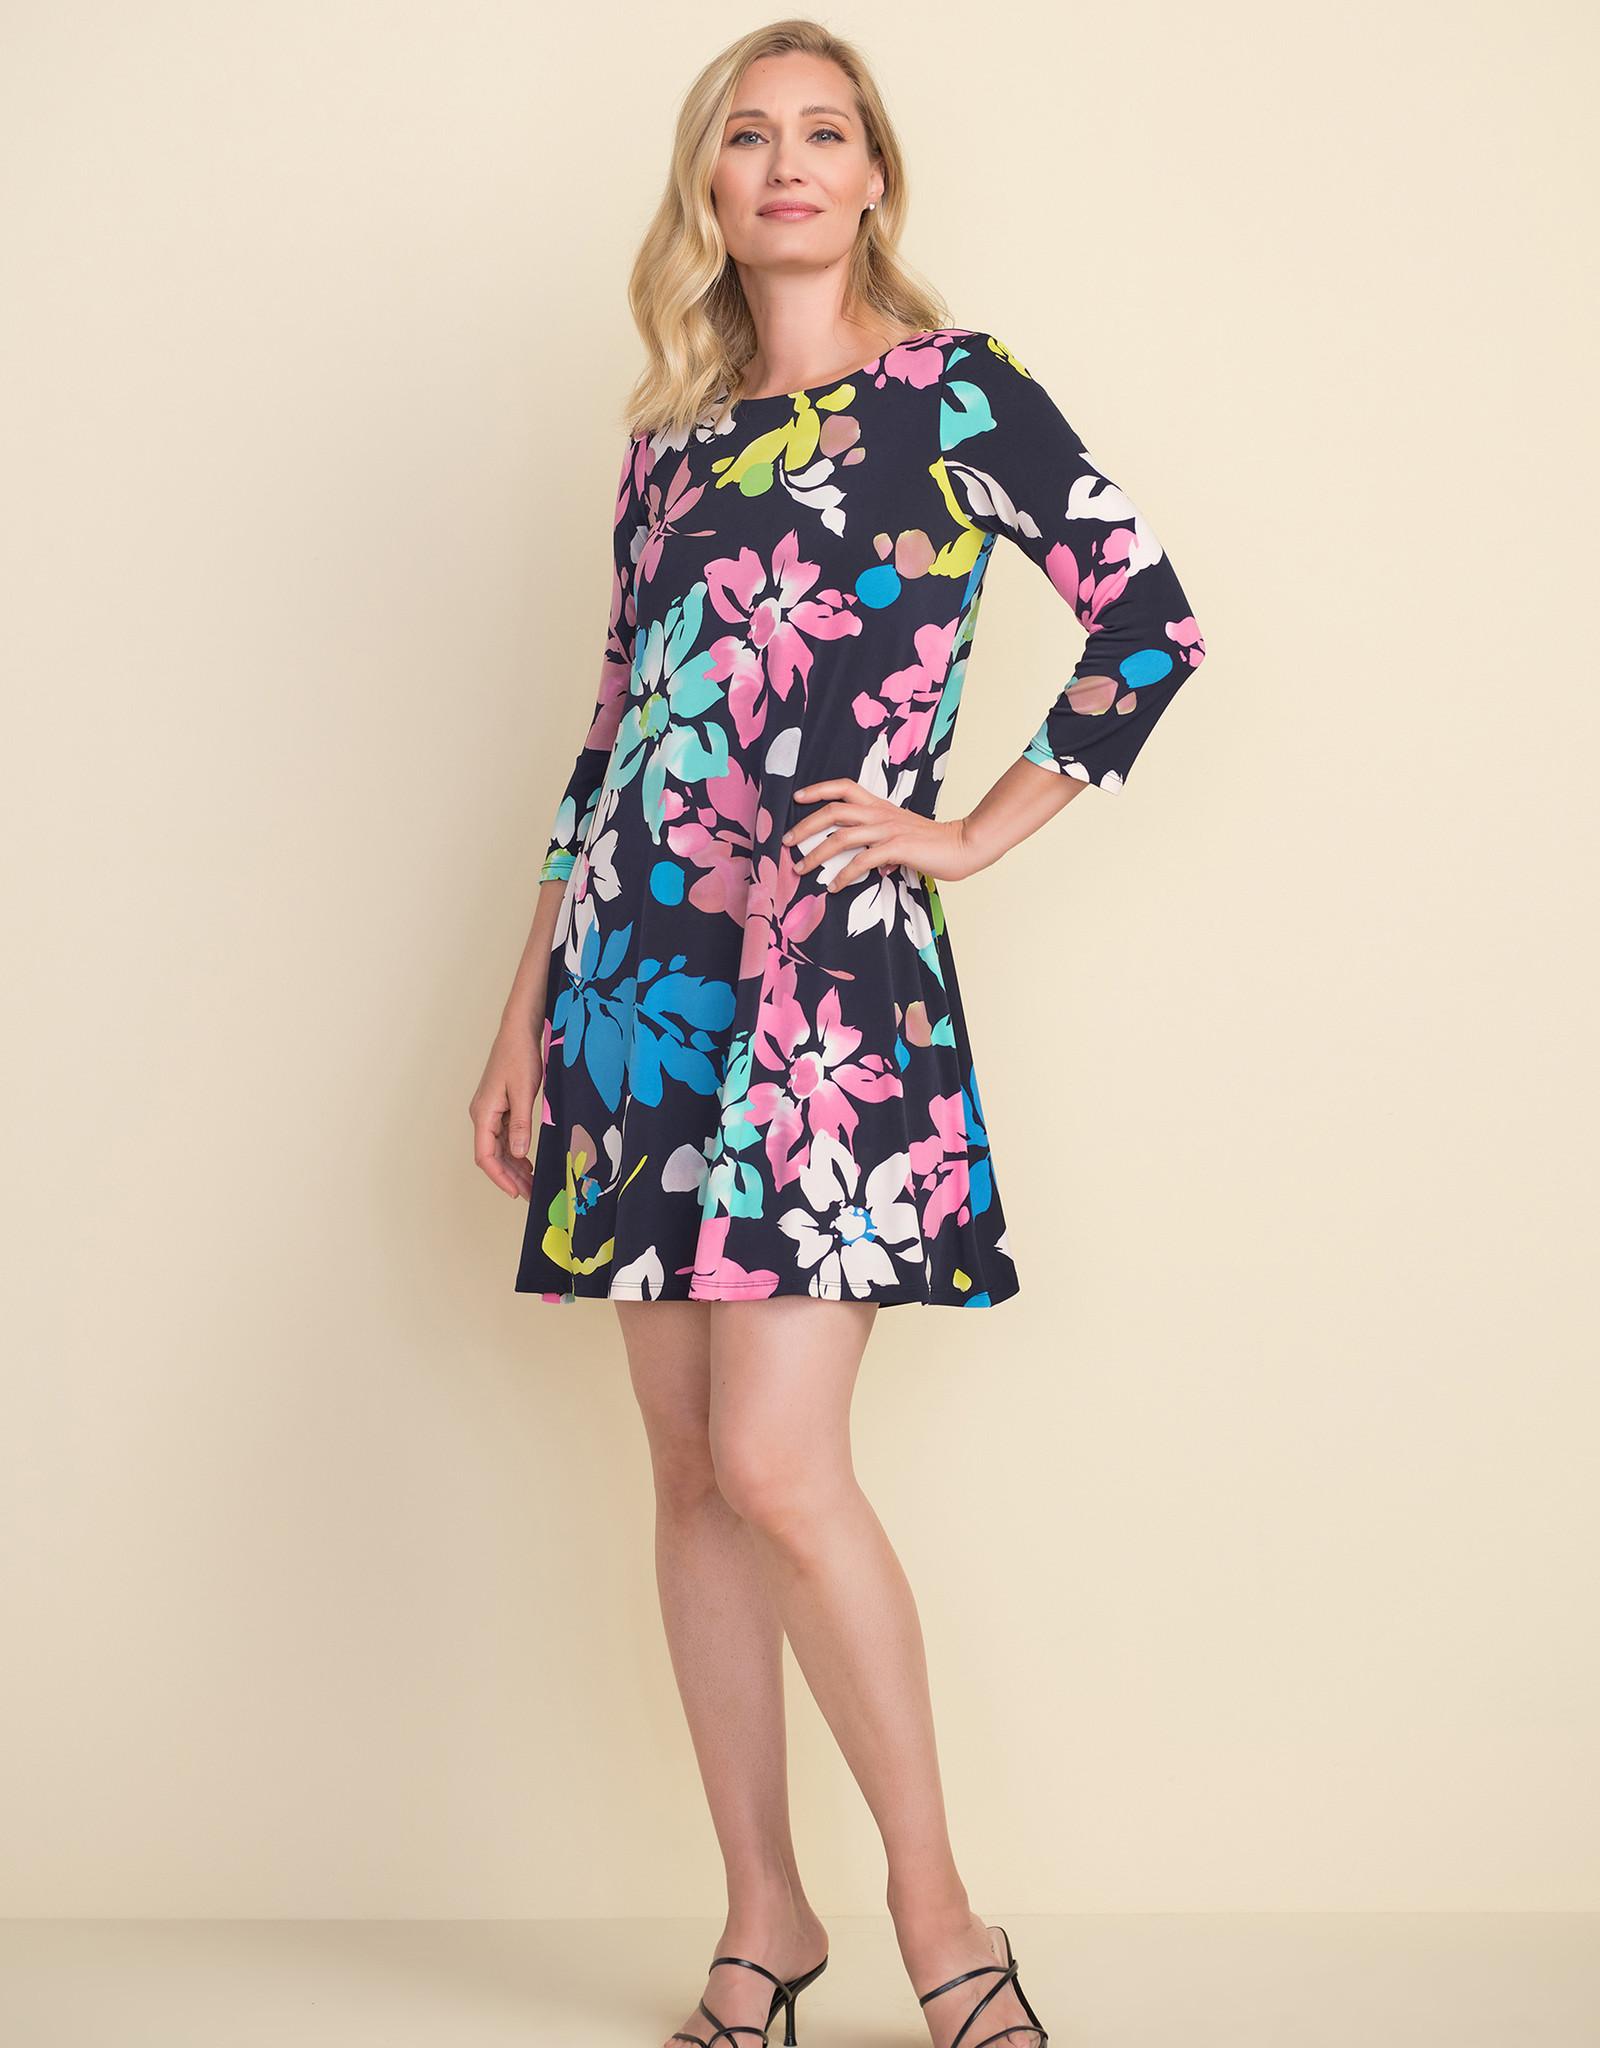 Joseph Ribkoff Joseph Ribkoff 212219 3/4 Sleeve Floral Dress